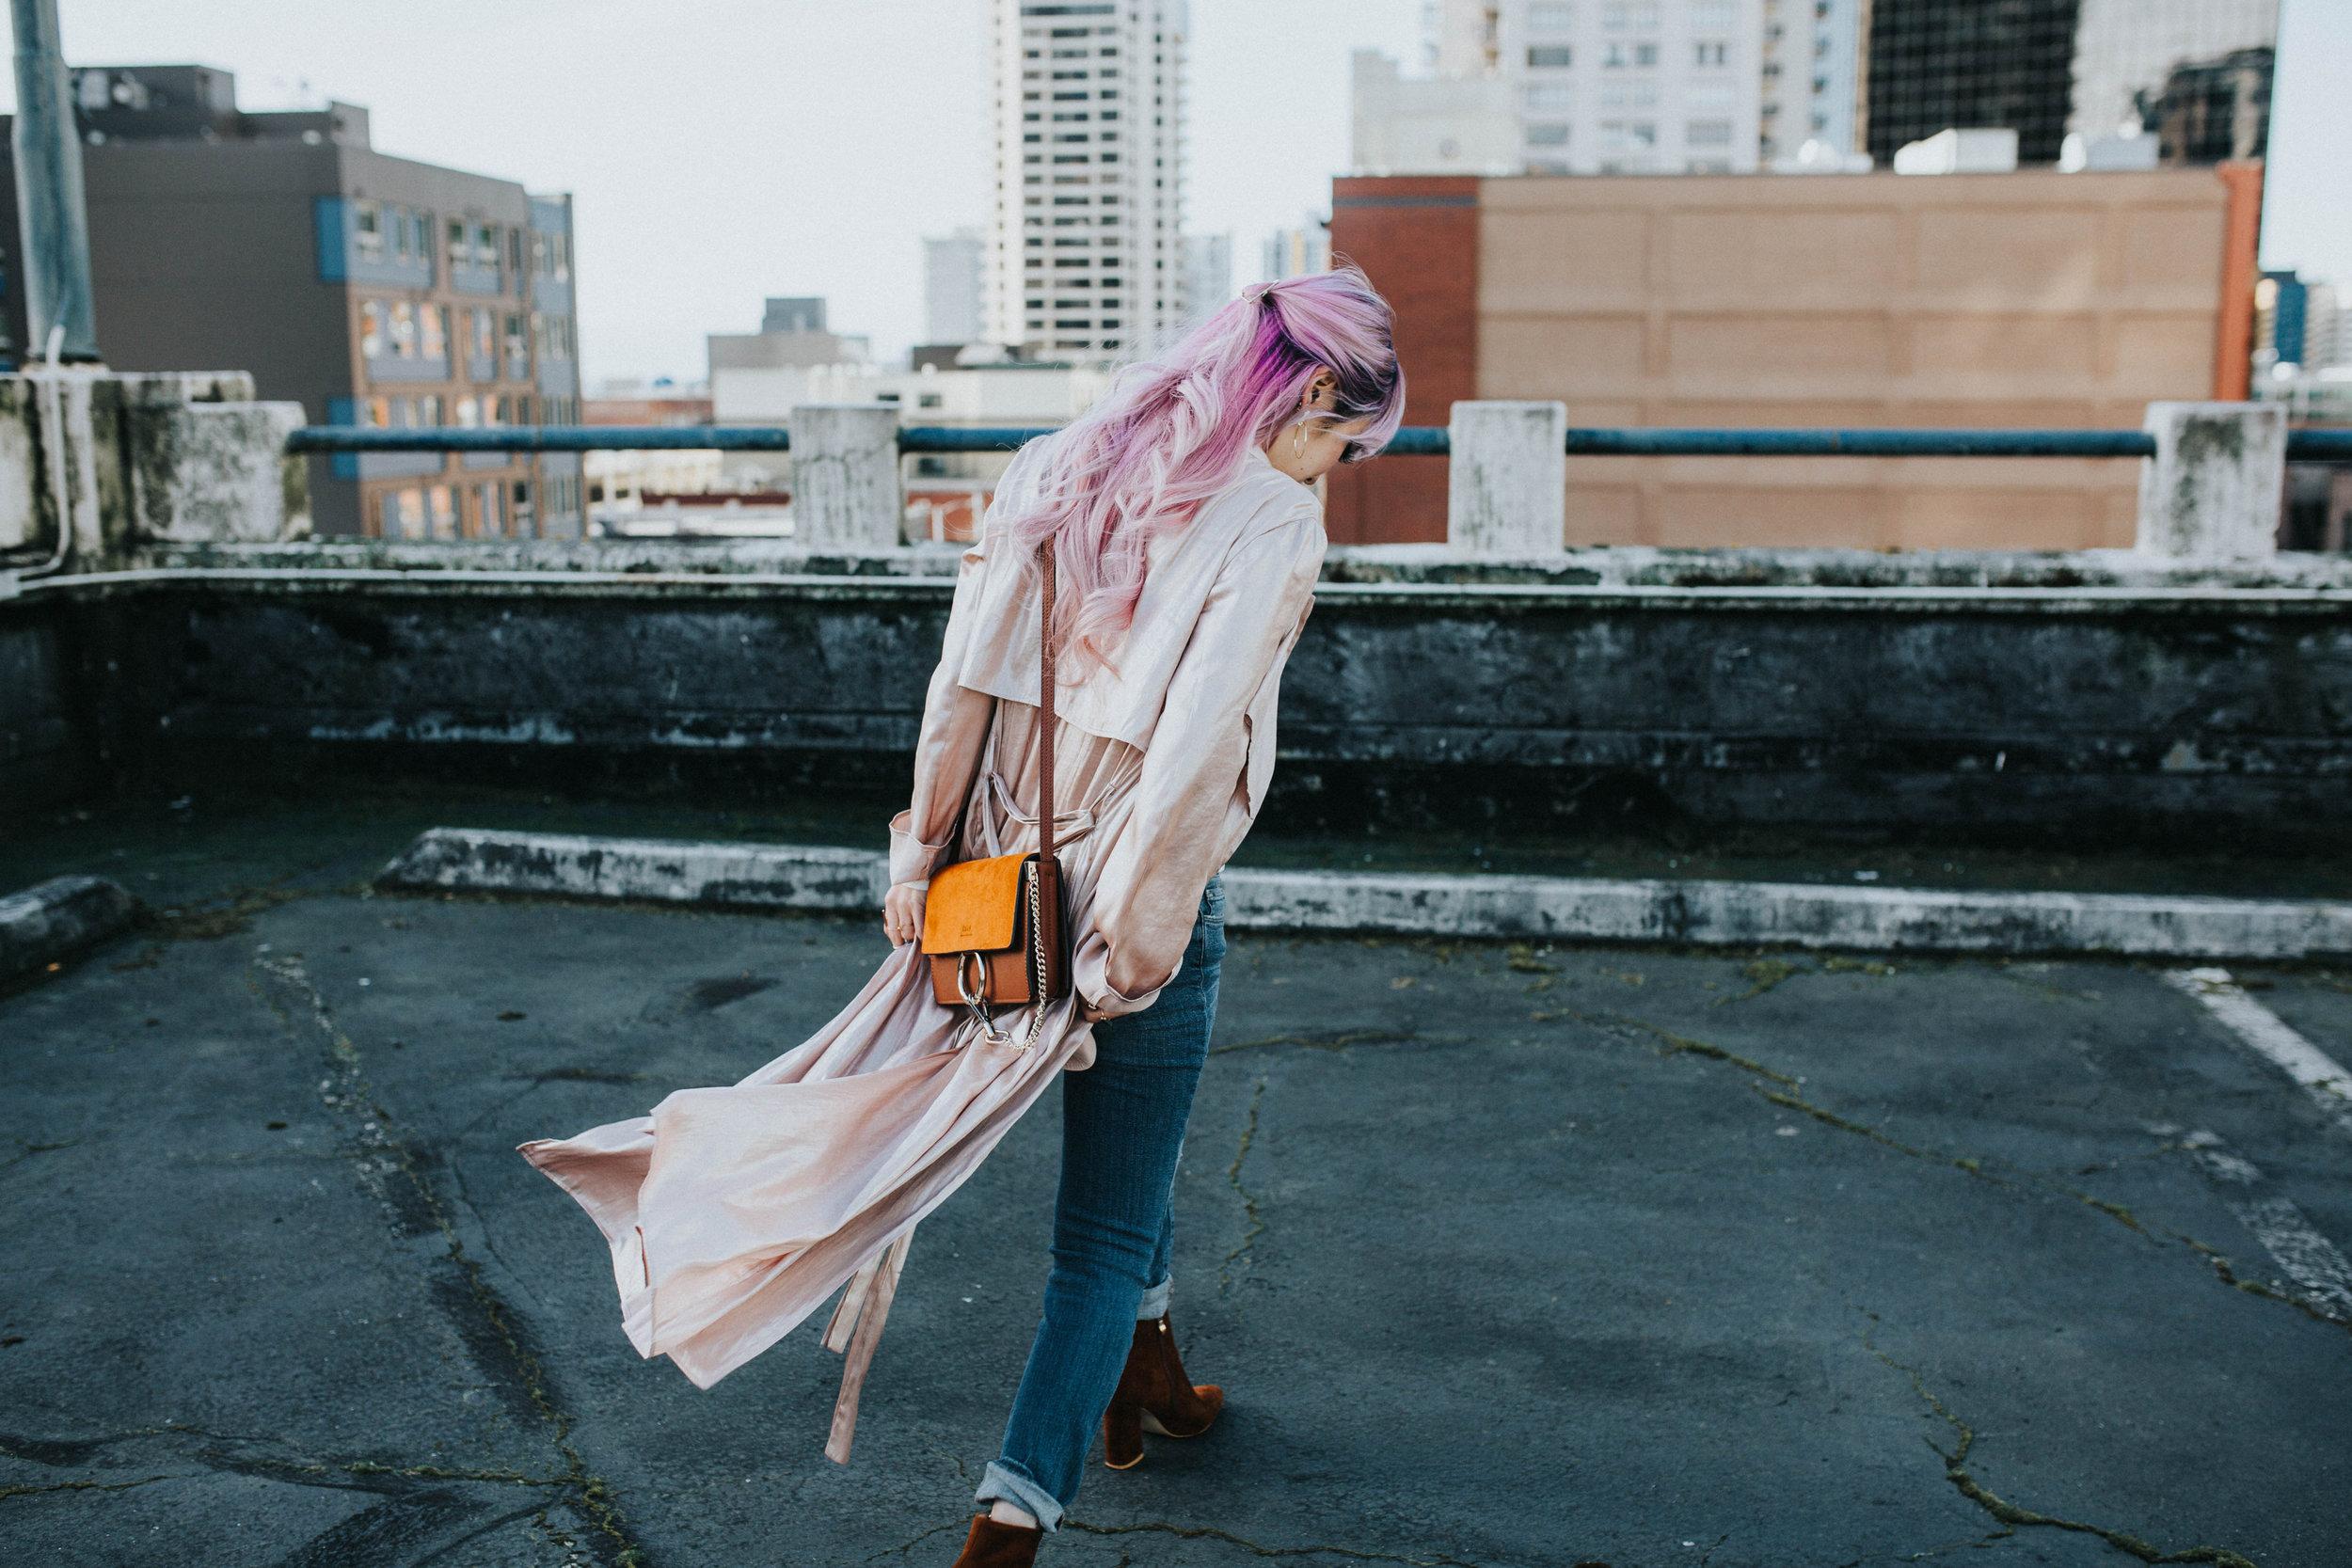 Mango Pink Metallic Trench Coat_ZARA White mock neck top_ZARA lace bralette_J Brand skinny jeans_Chloe Mini Faye Leather Shoulder Bag_Ego Ankle Boots_Free People Aviator Sunglasses_Argento Vivo Earrings_Aikas Love Closet_Seattle Style Fashion Blogger_Japanese_Pink hair